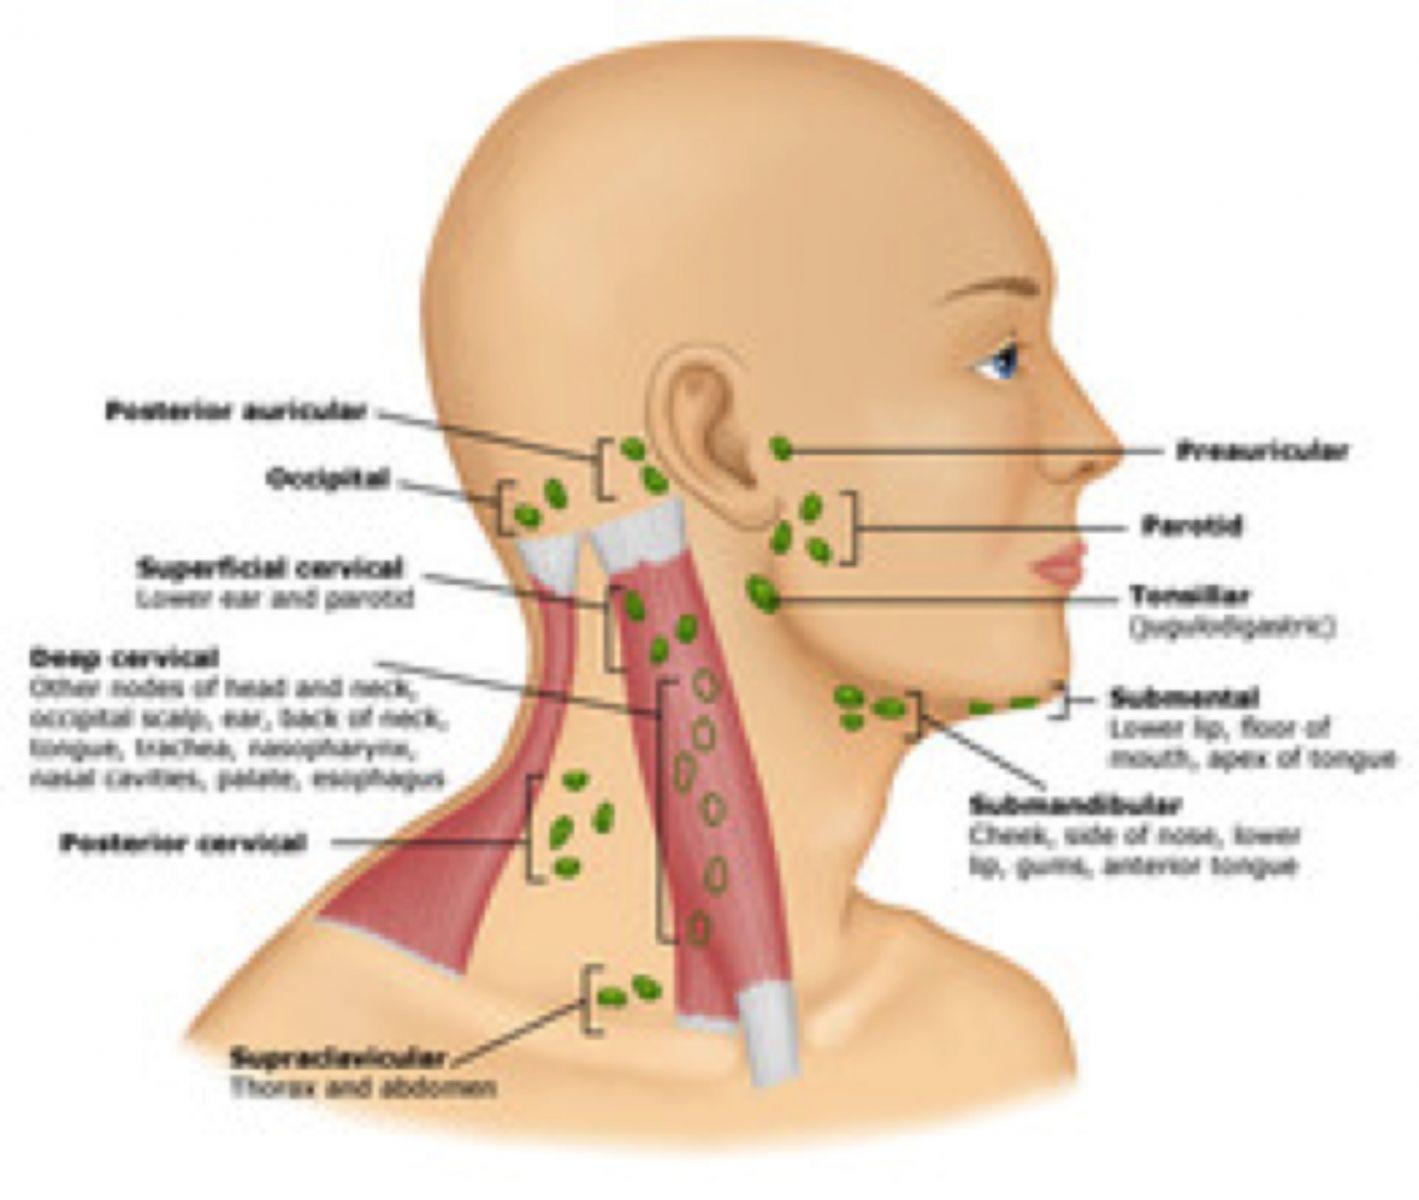 lymph nodes map, gallery: lymph nodes map, human anatomy diagram ...